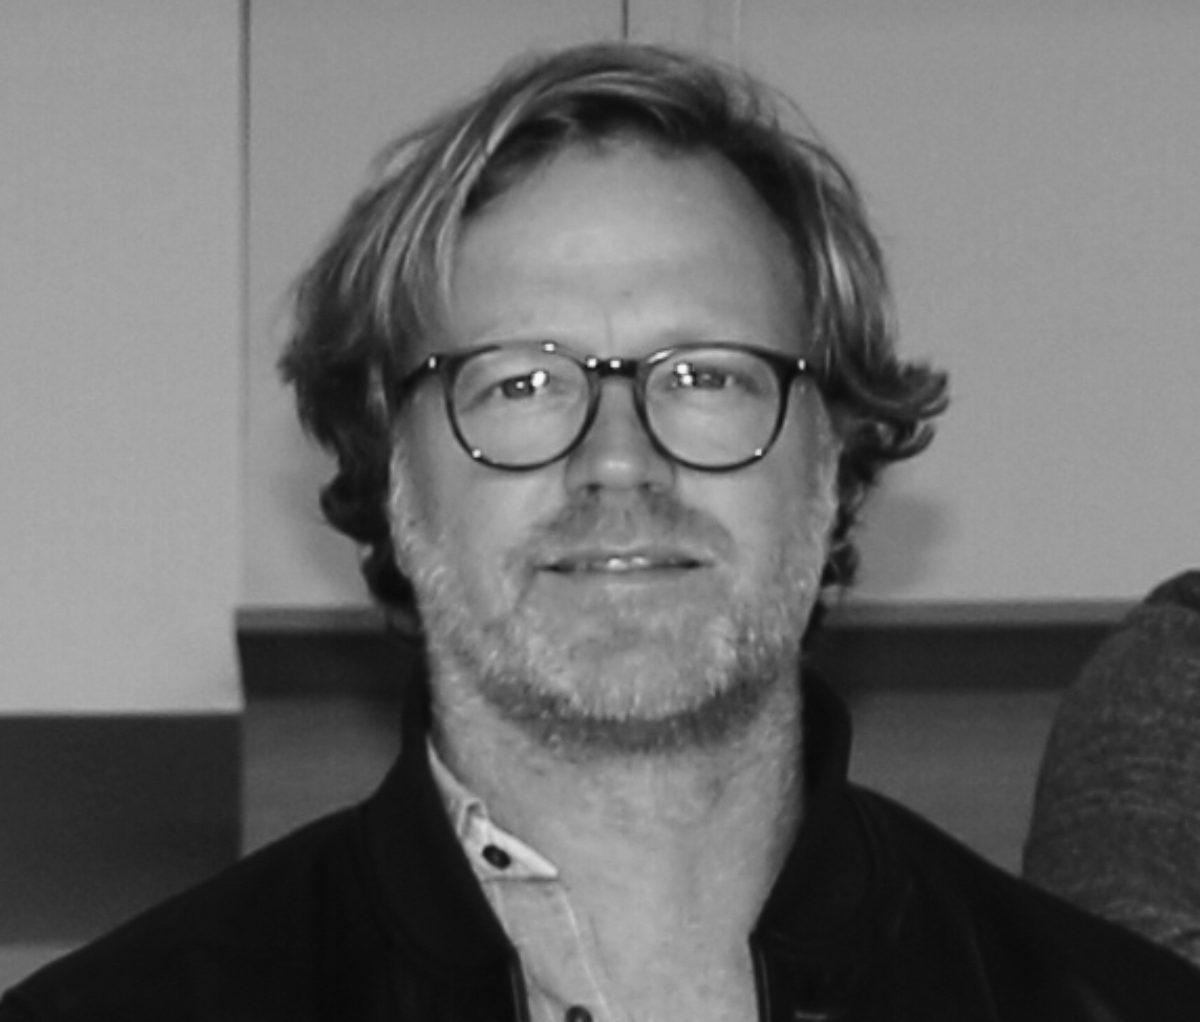 Rico Zorkendorfer